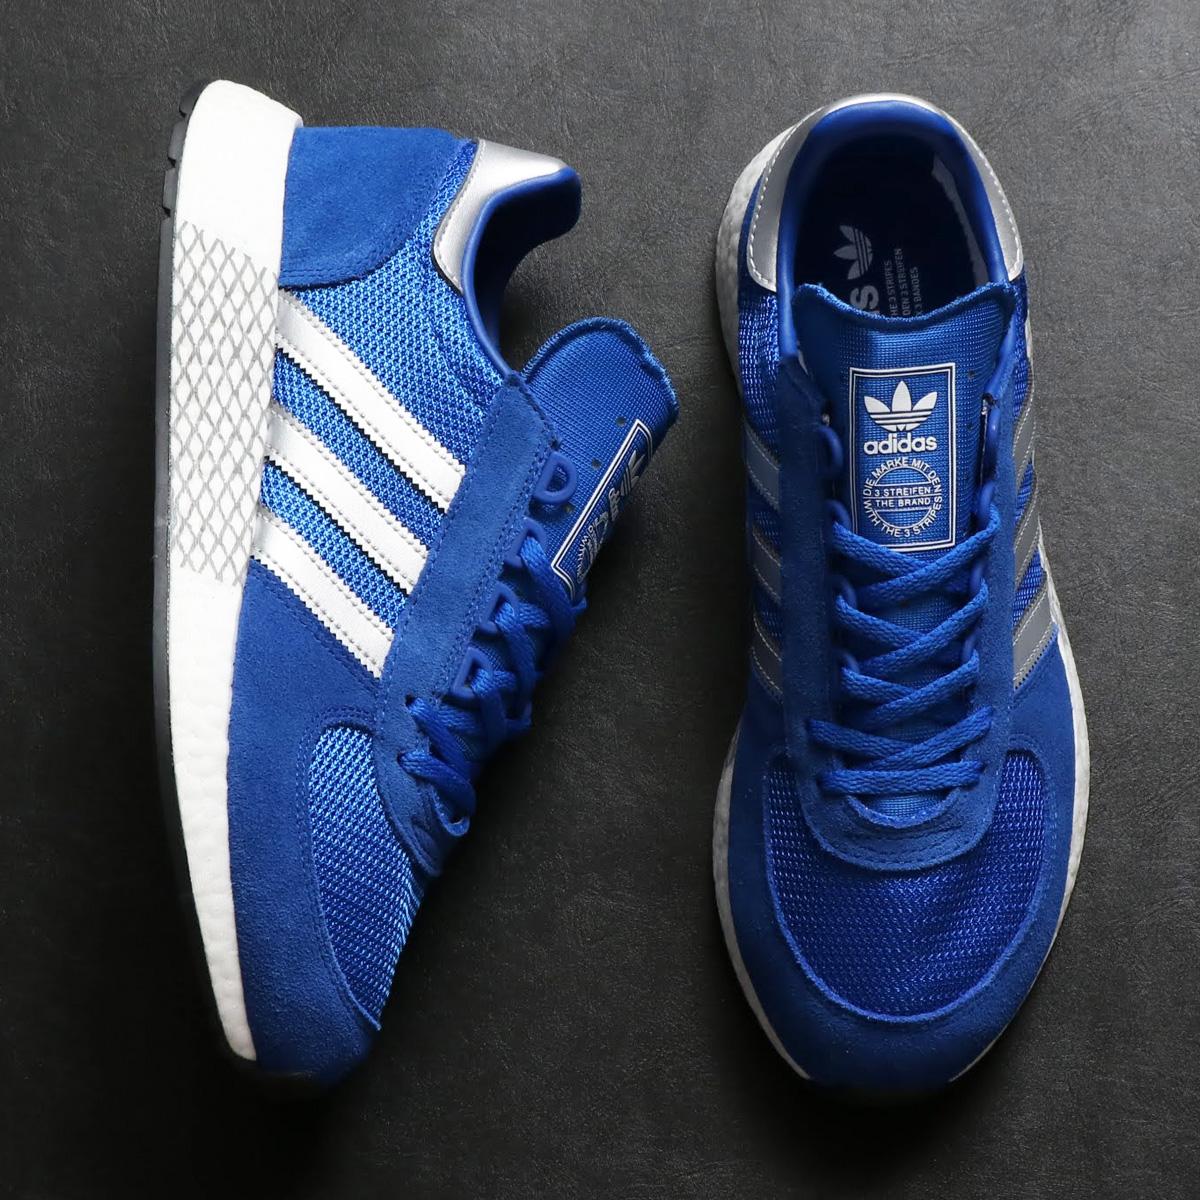 adidas Originals MARATHON x 5923 (アディダス オリジナルス マラソン × 5923)BLUE/SILVER MET/COLLEGE ROYAL【メンズ スニーカー】18FW-I